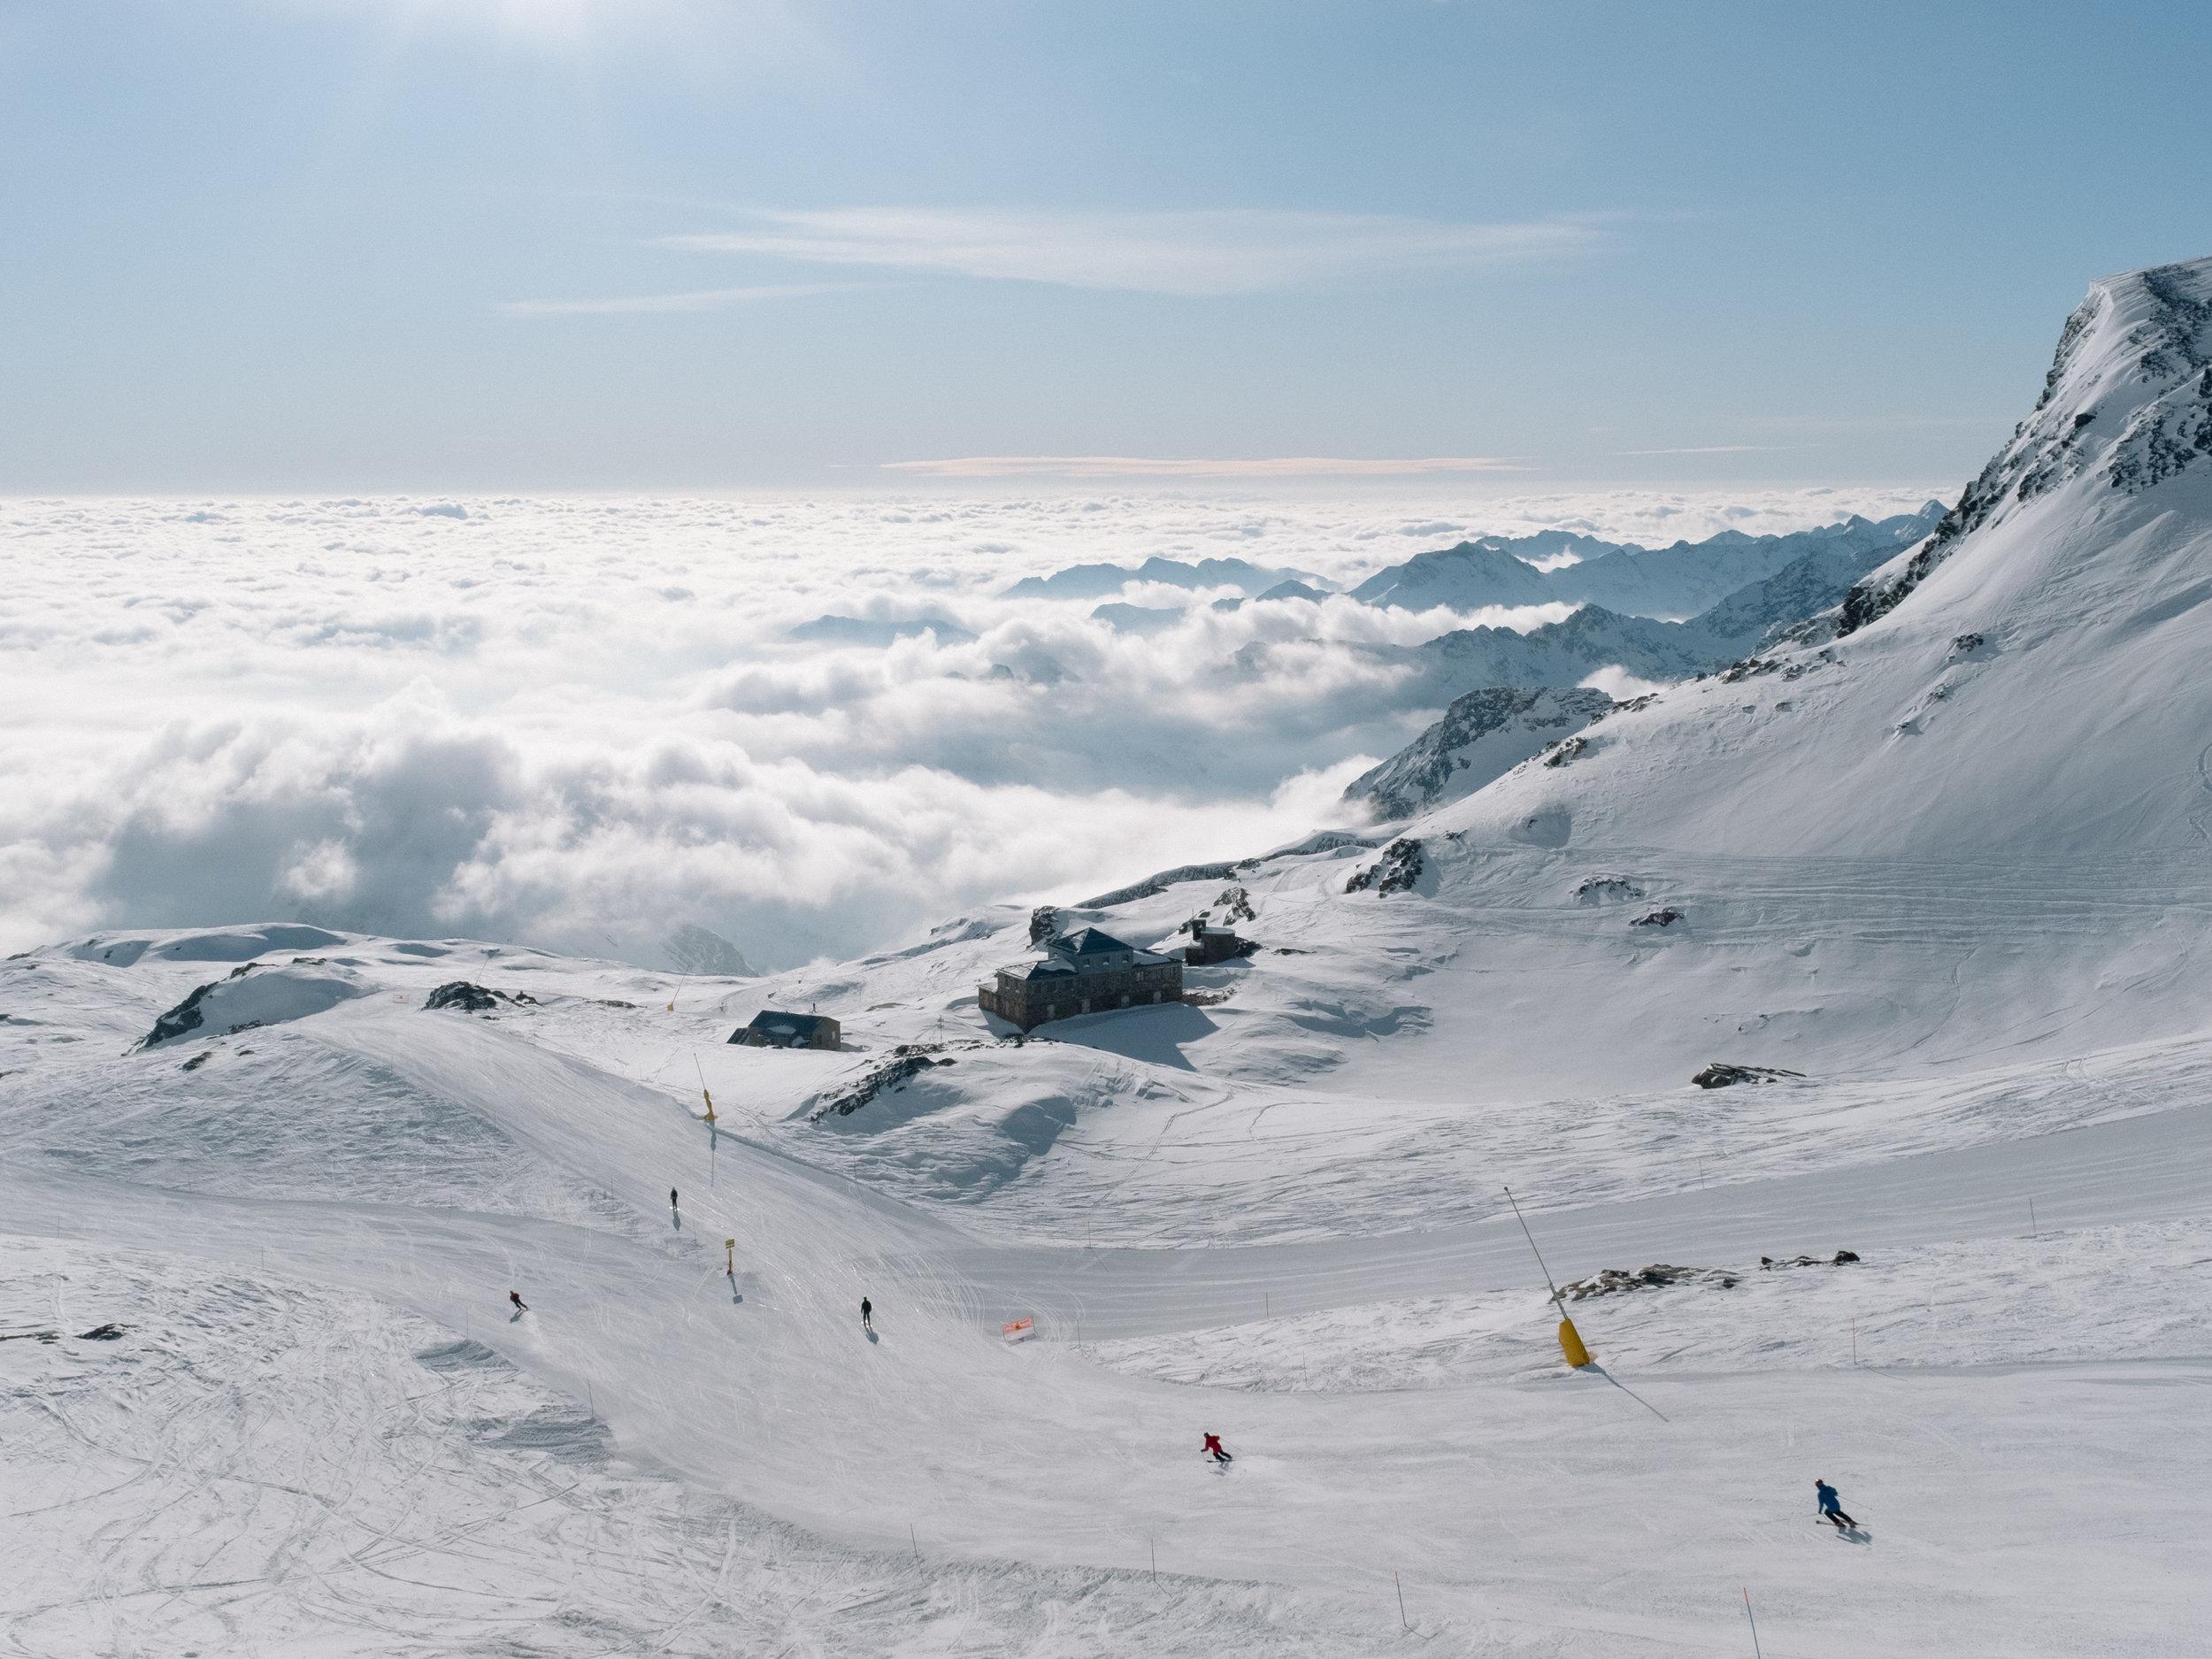 BenReadPhotography_Skiing_Alagna-11.jpg